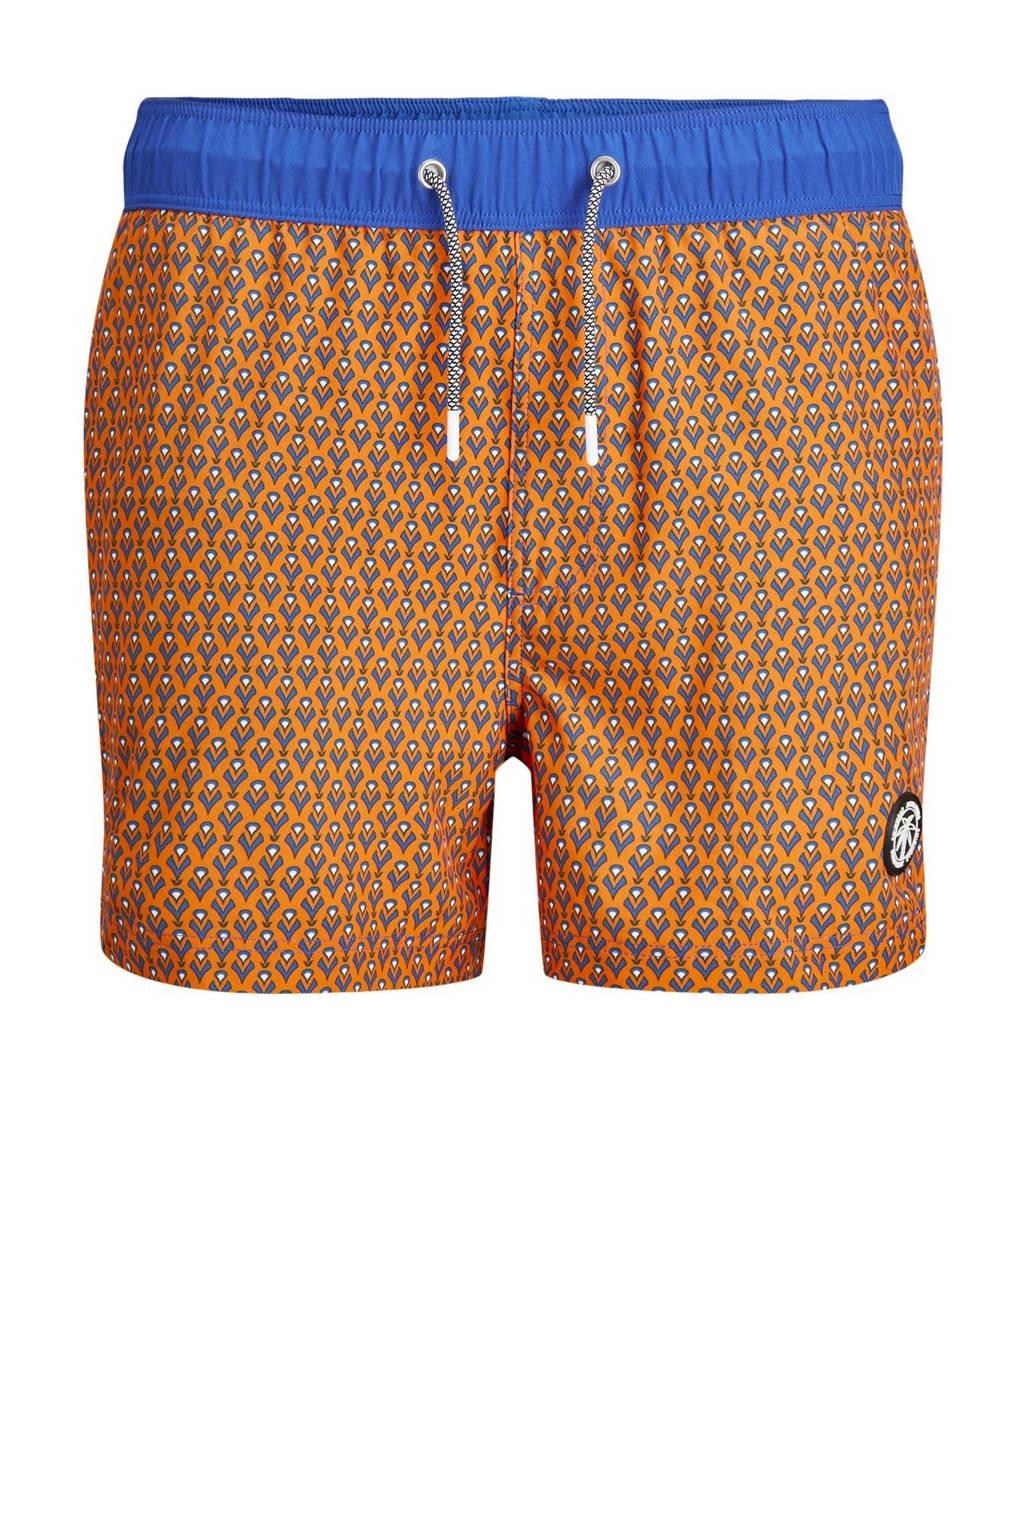 JACK & JONES JEANS INTELLIGENCE zwemshort Maui met all over print oranje/blauw, Oranje/blauw